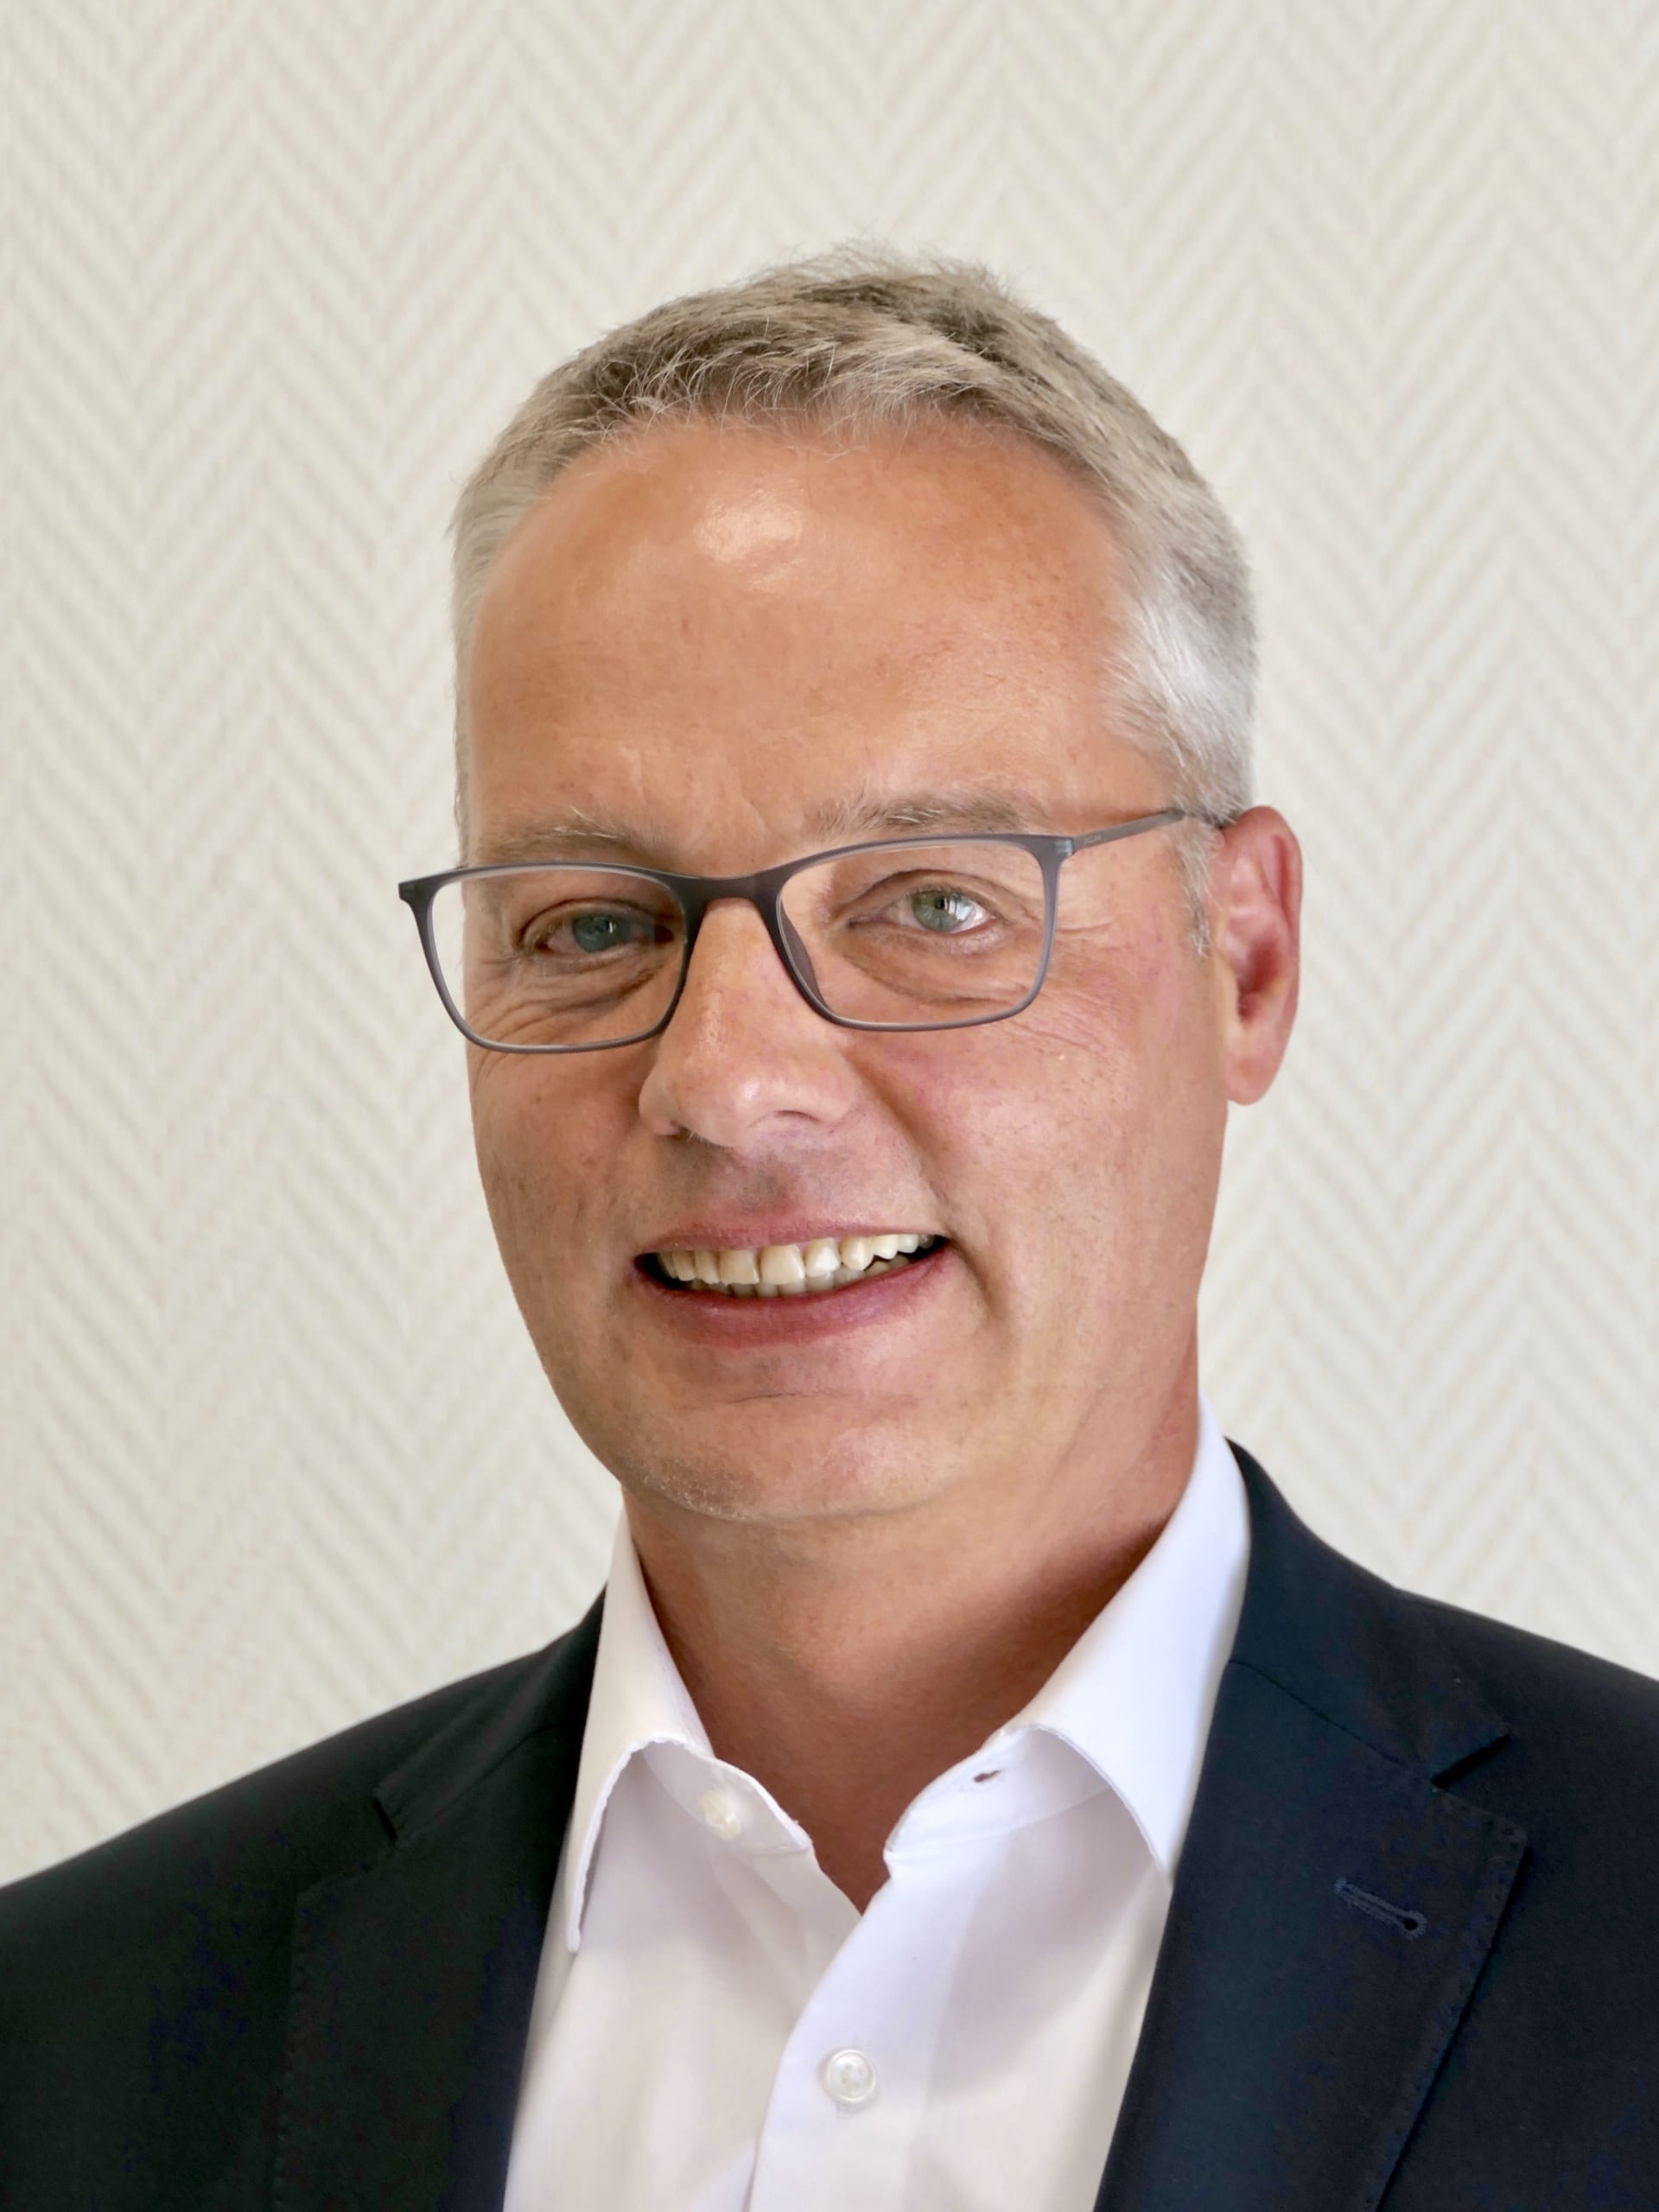 Jürgen Klocke